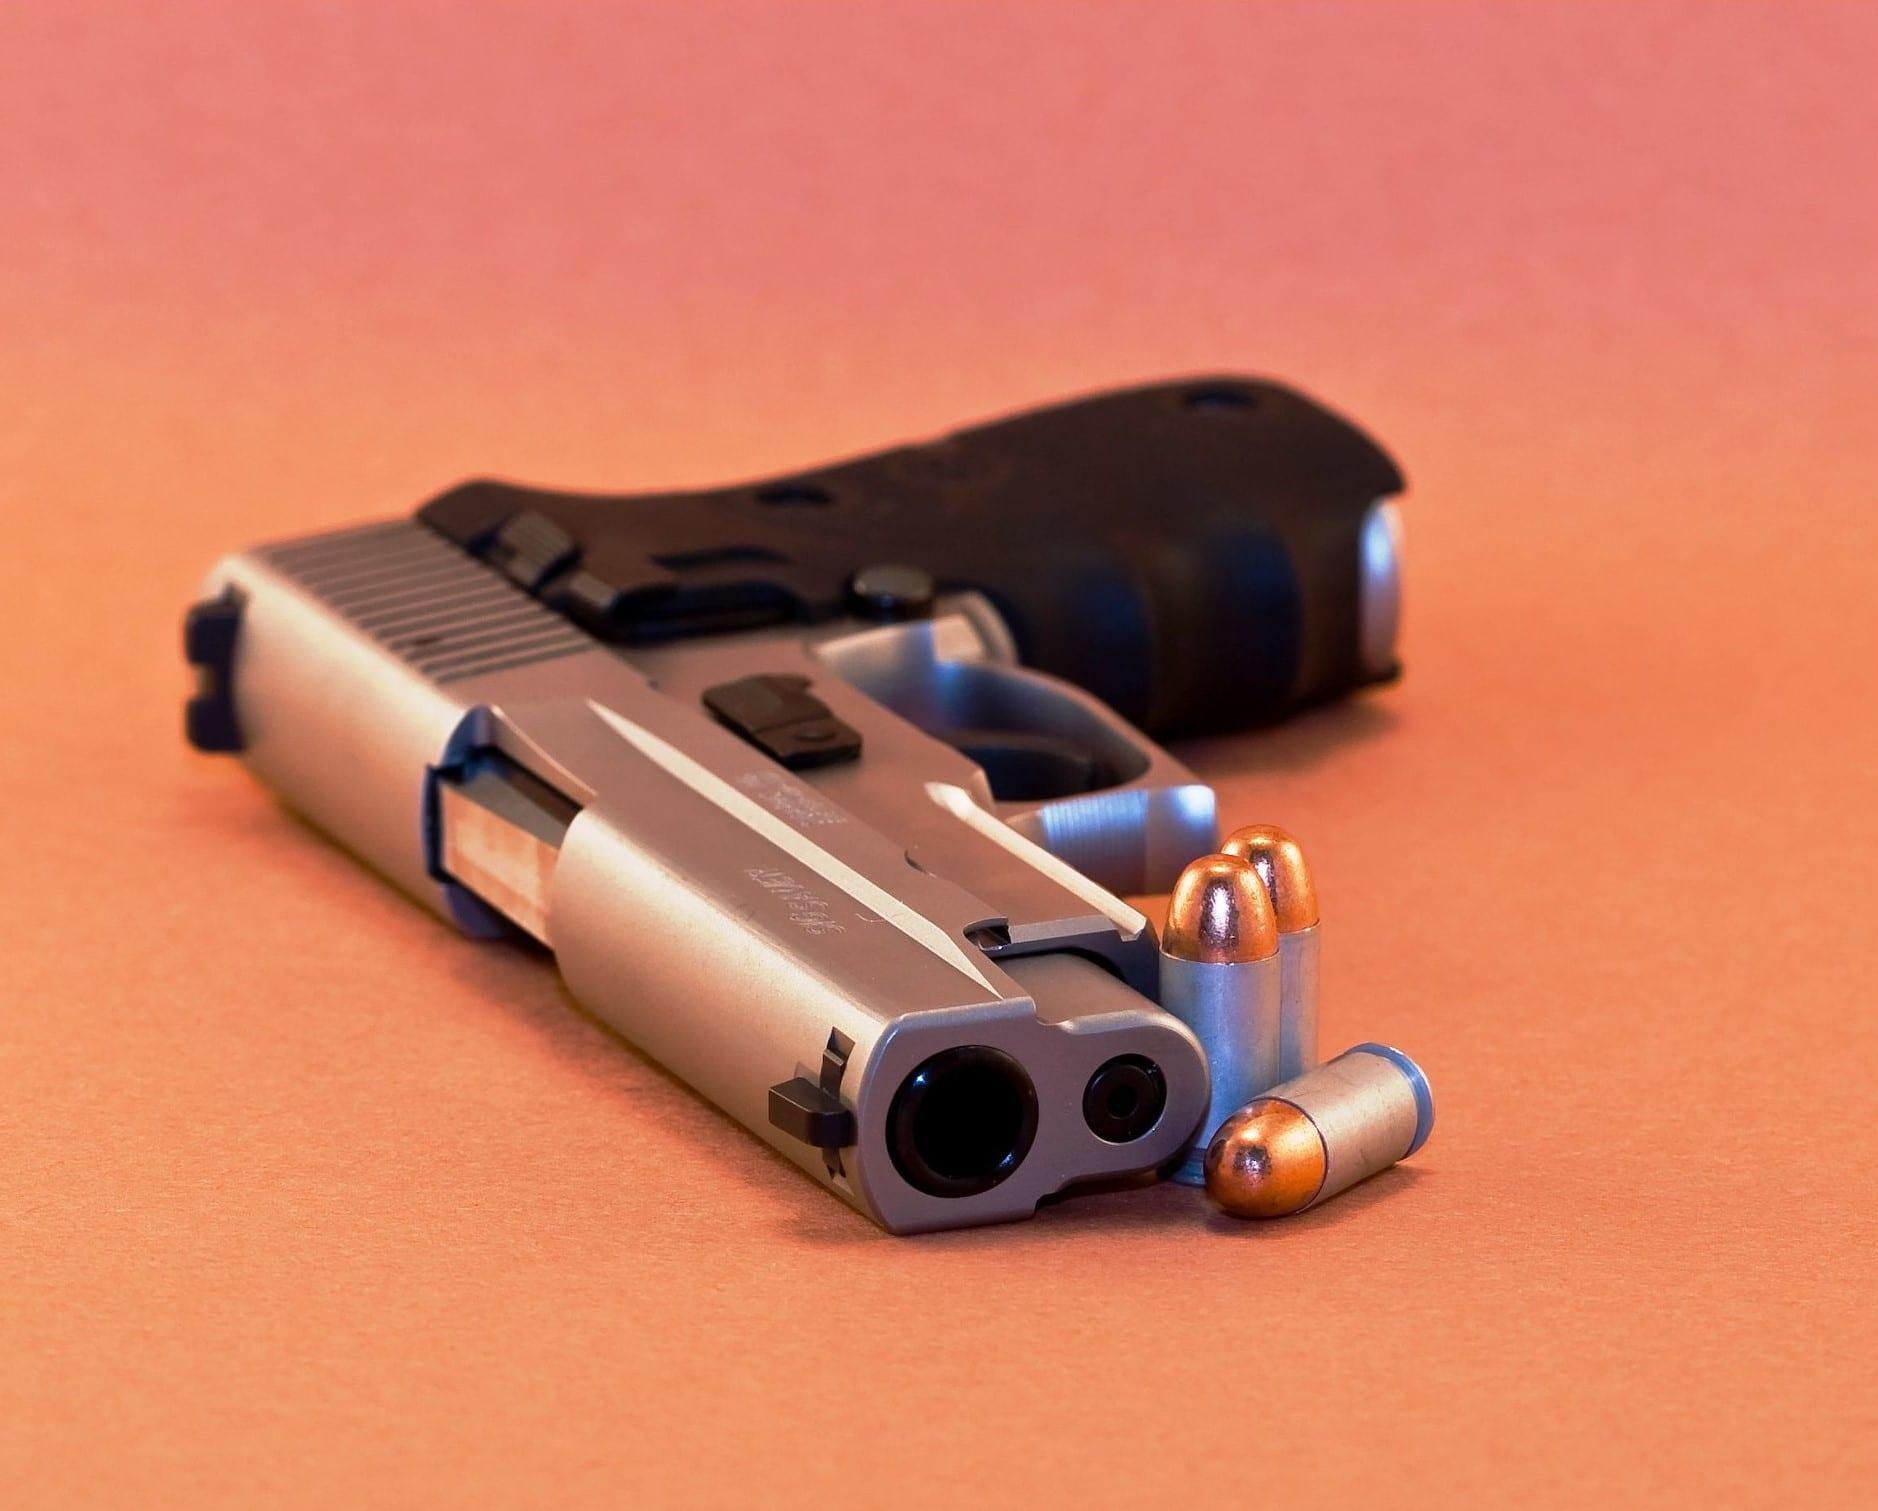 45 pistol size